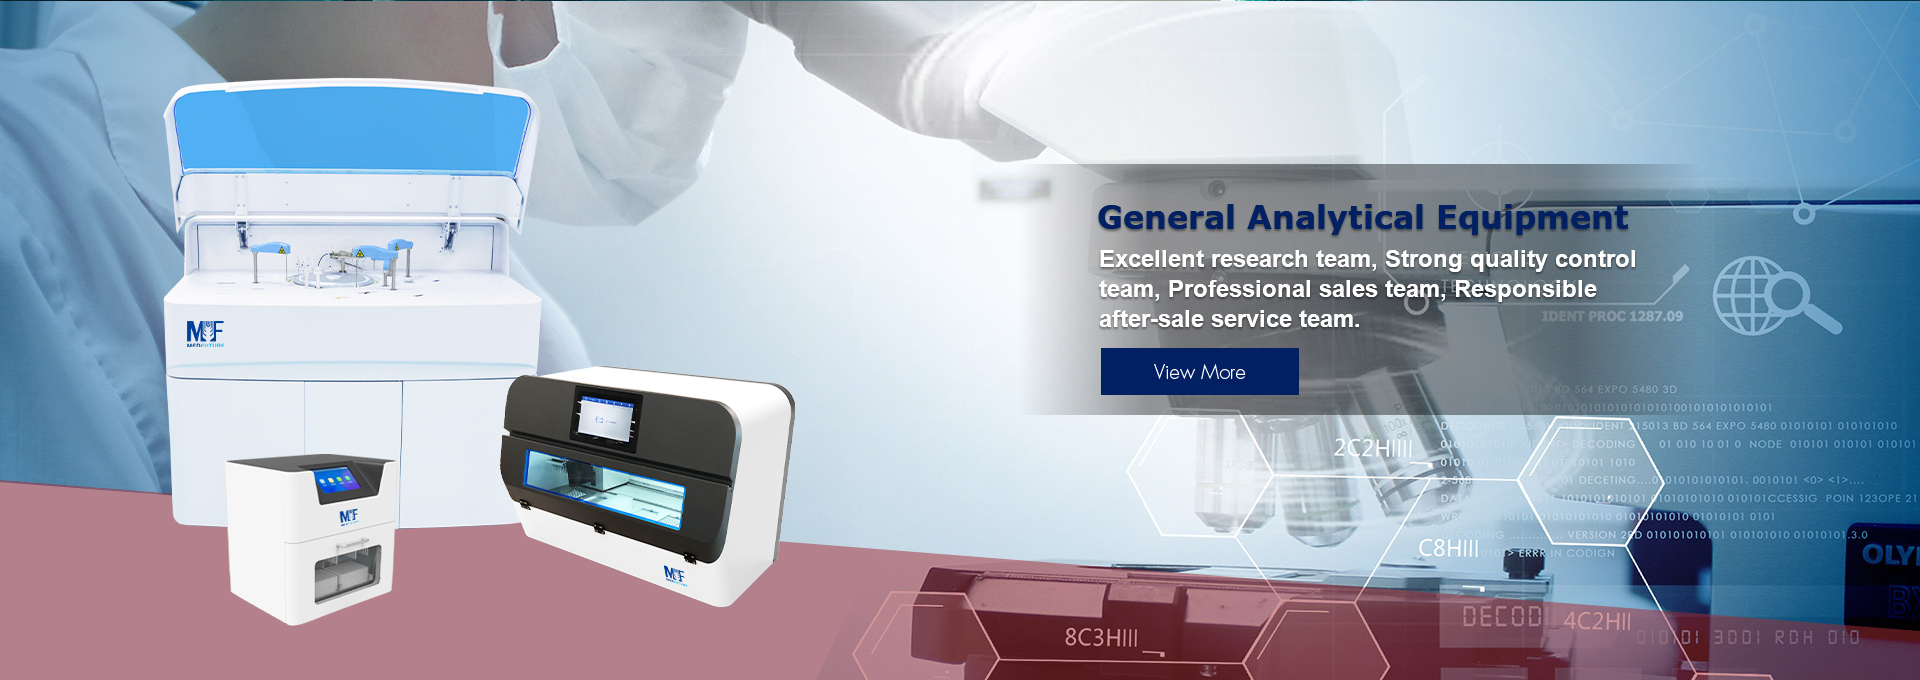 General Analytical Equipment